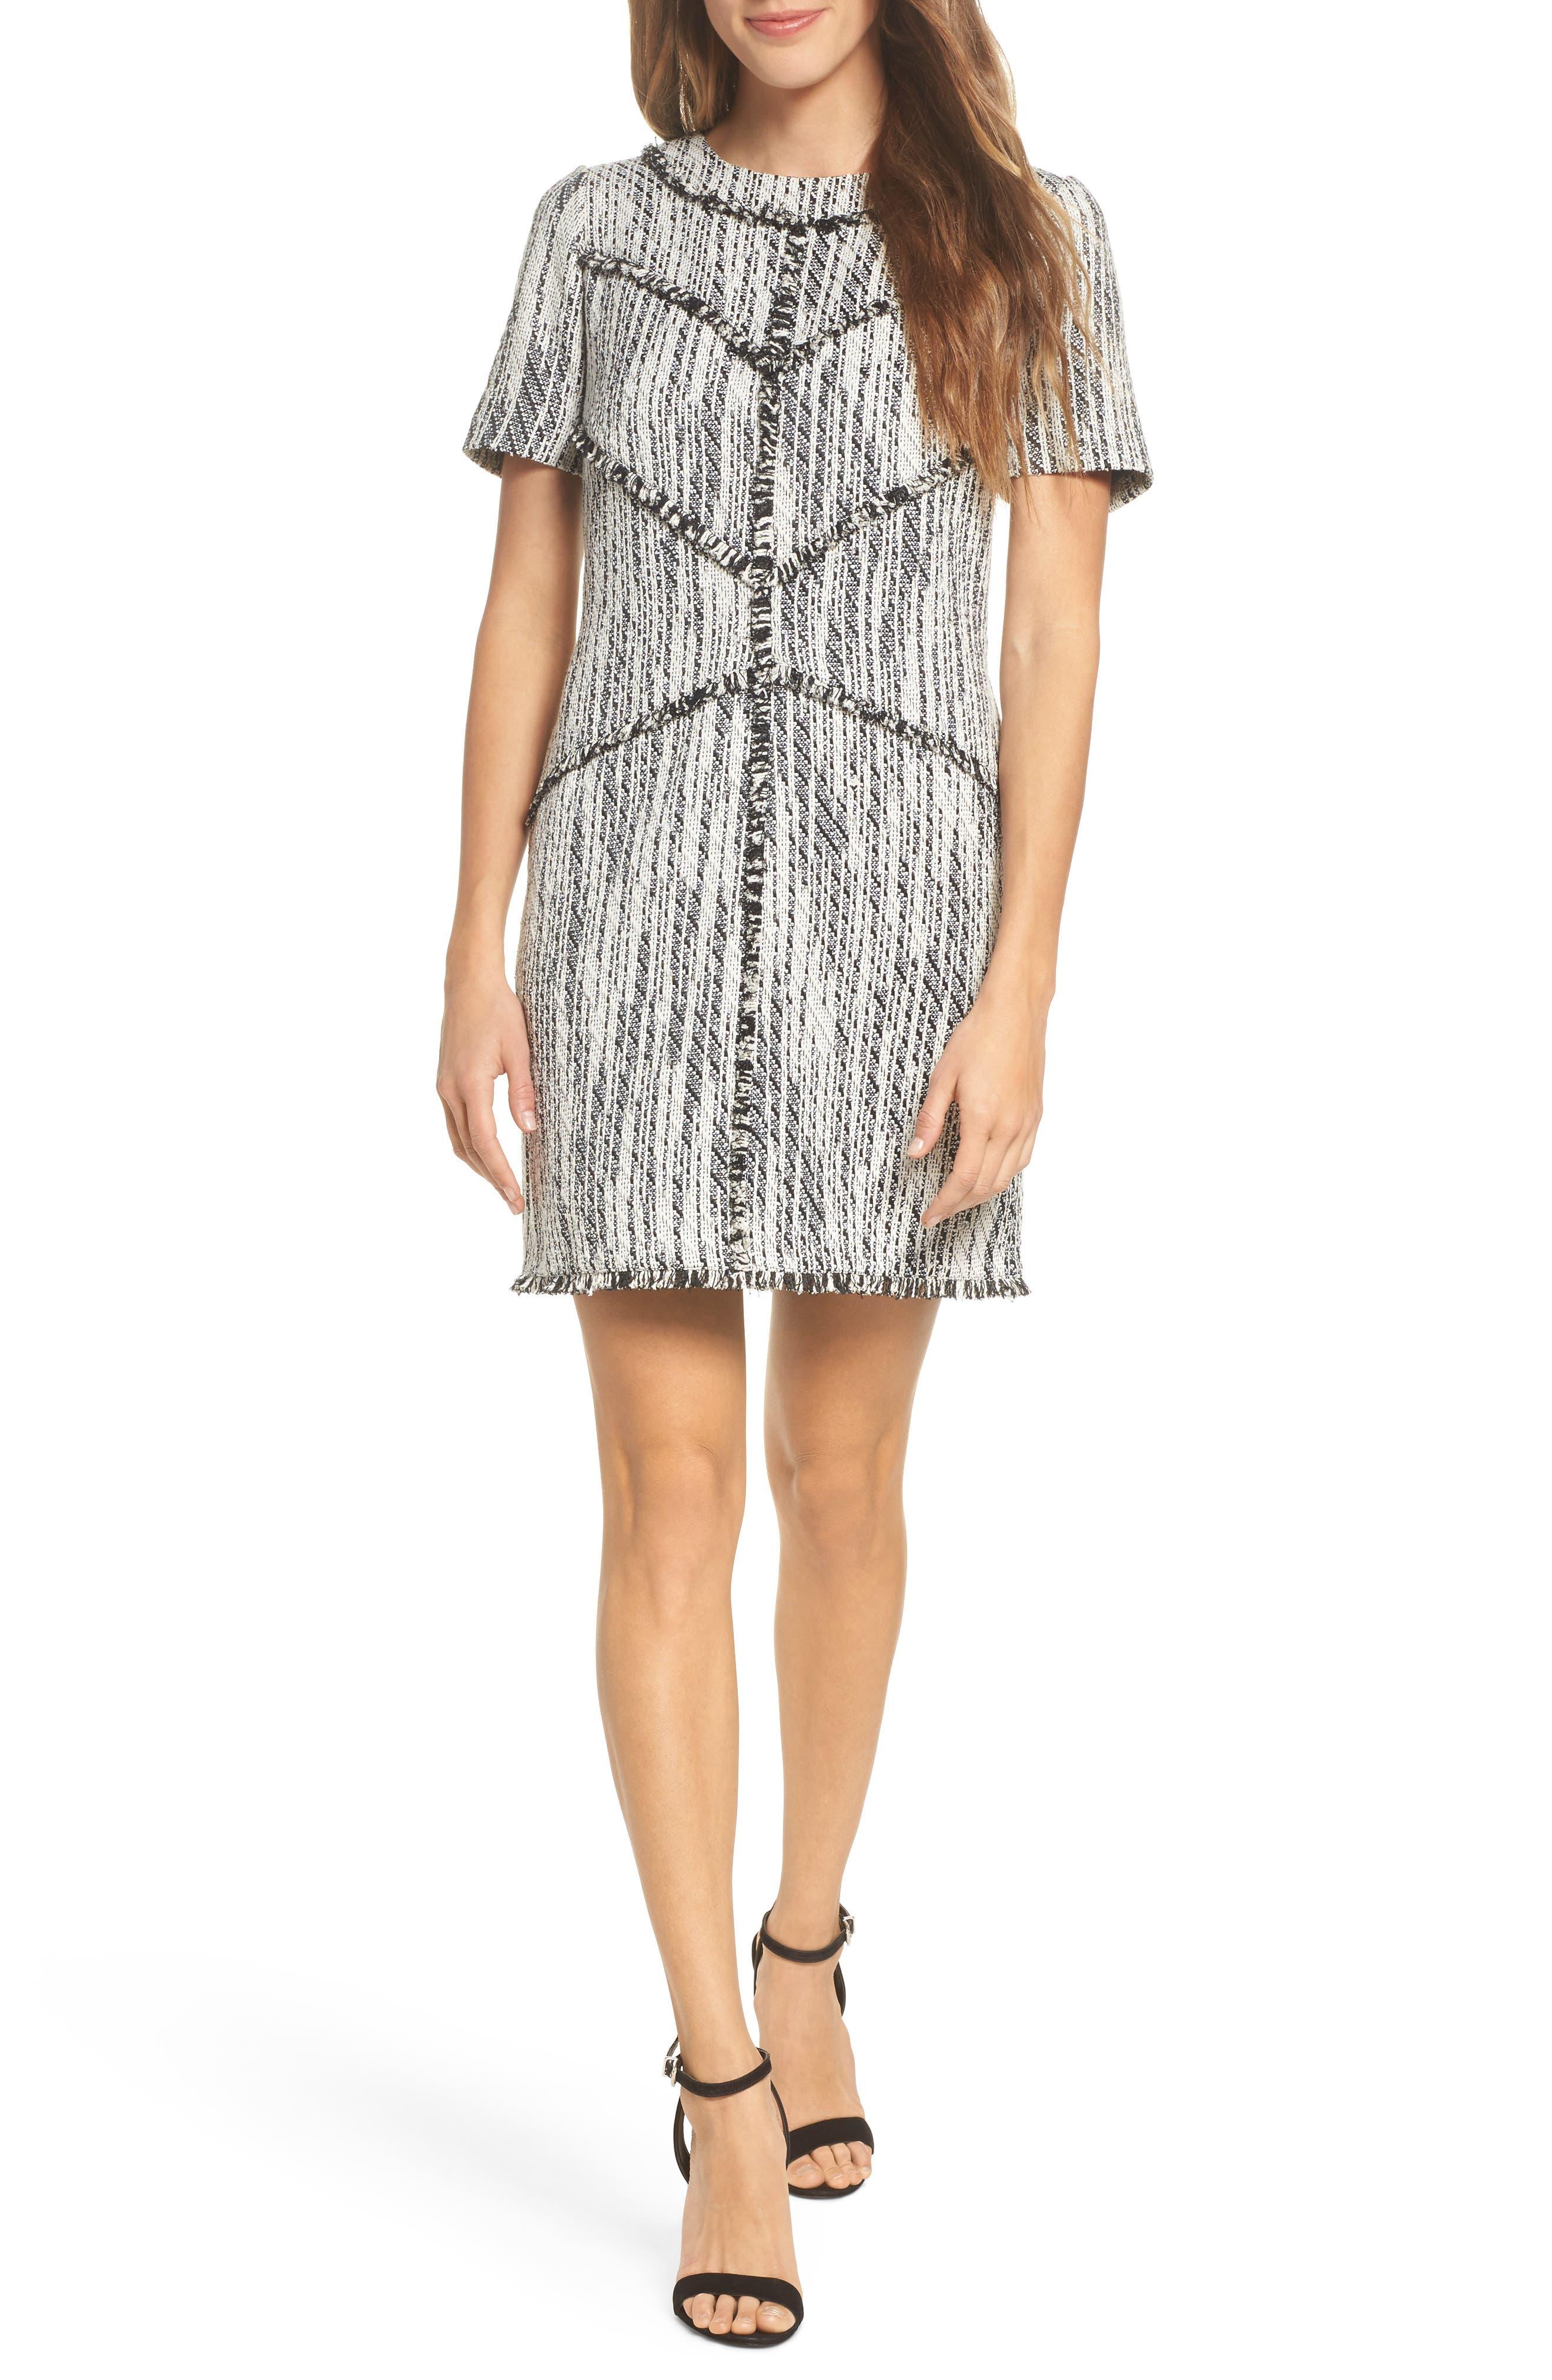 Dolce Vita Tweed Shift Dress,                             Main thumbnail 1, color,                             Black/ Ivory Tweed